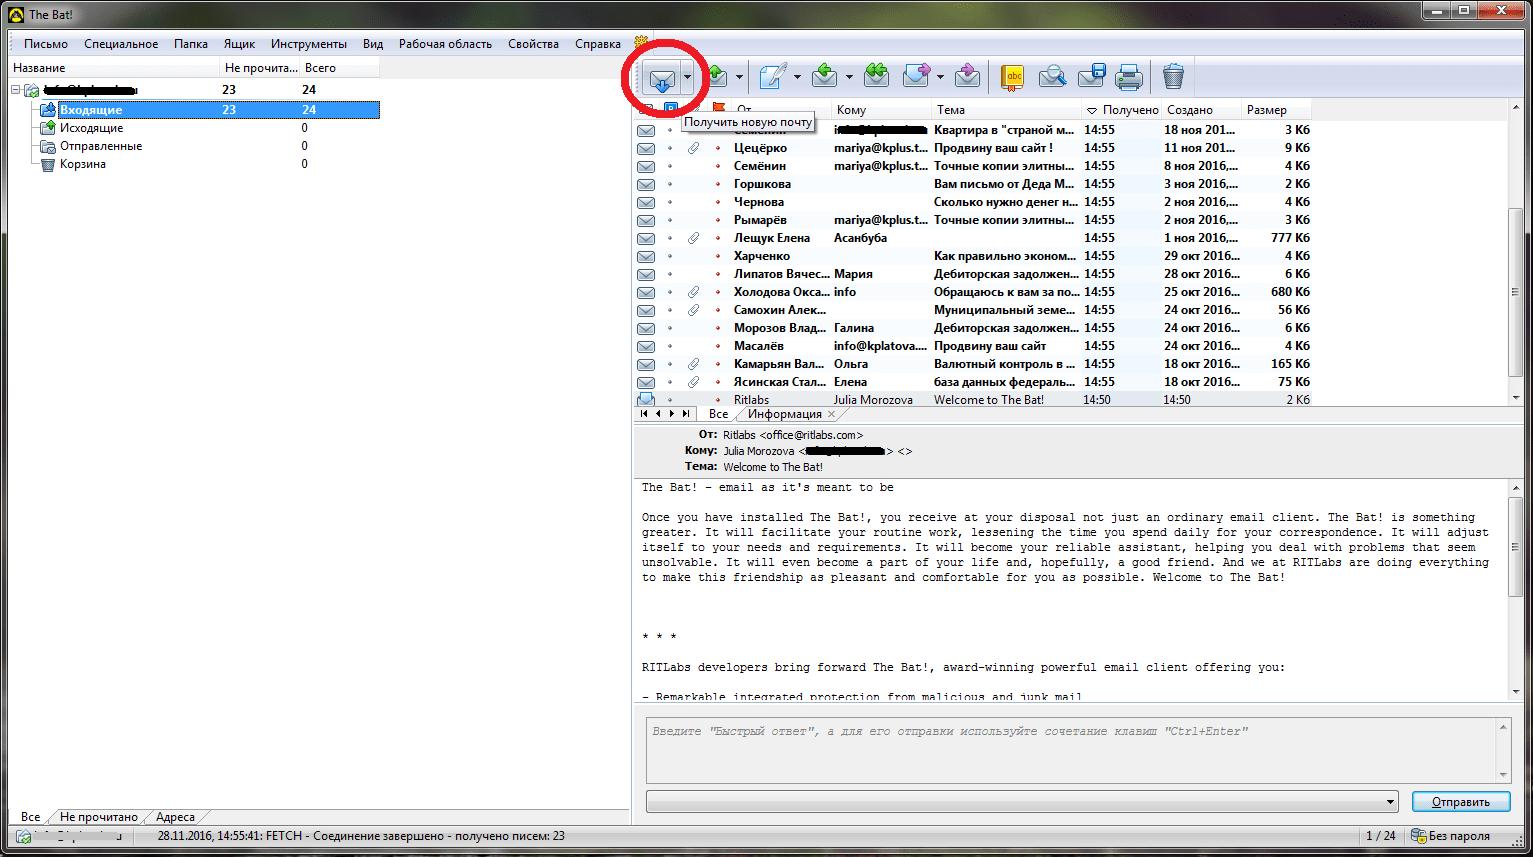 https://webhost1.ru/upload/help/mail/thebat/4-min.png